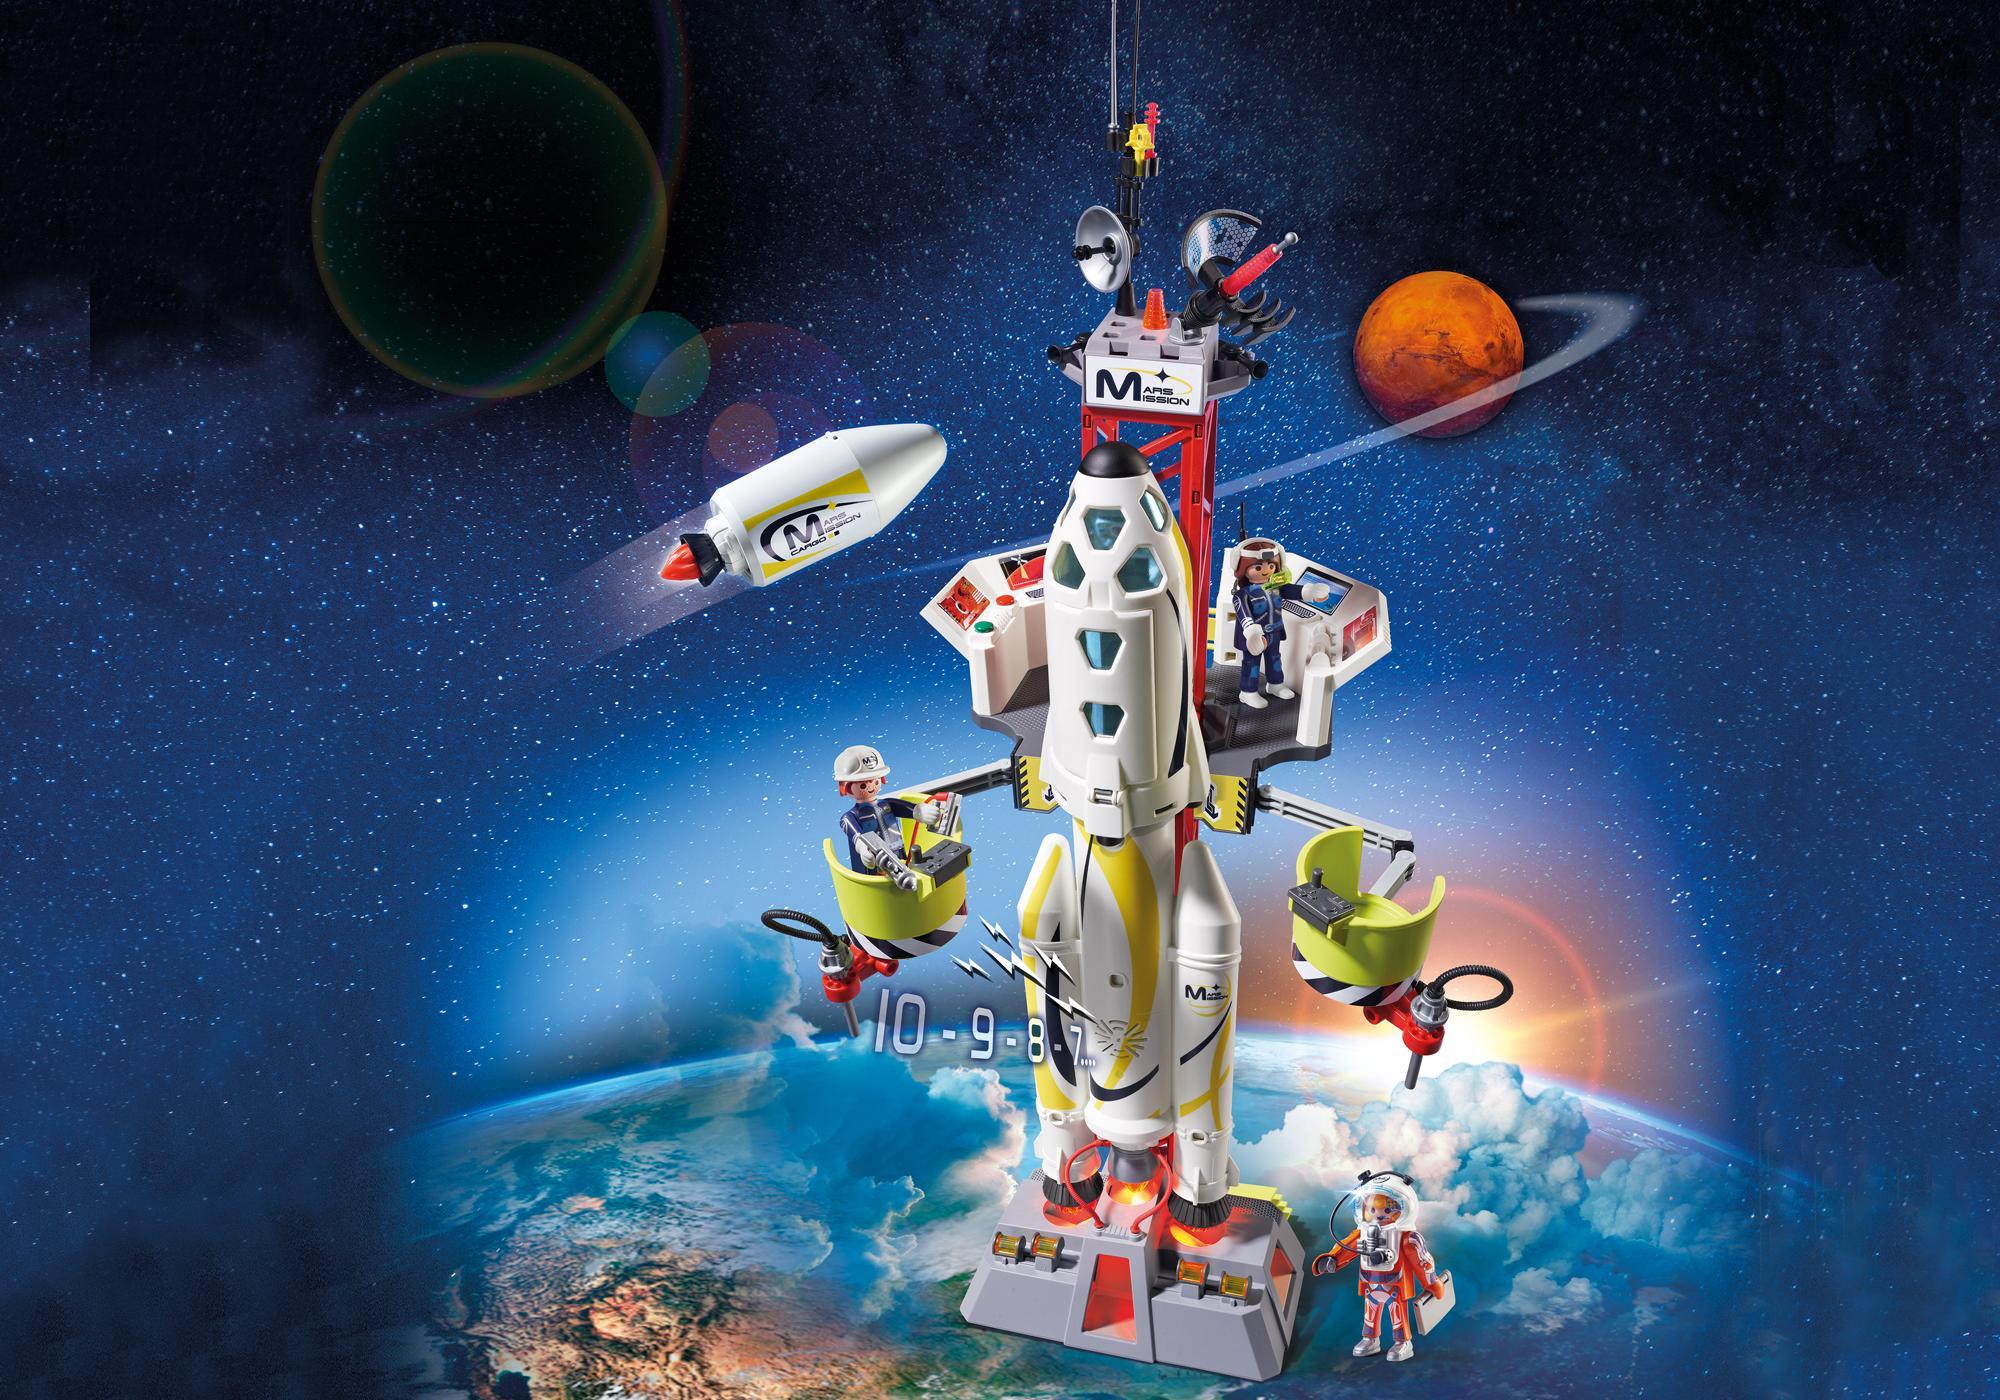 http://media.playmobil.com/i/playmobil/9488_product_detail/Cohete con Plataforma de Lanzamiento